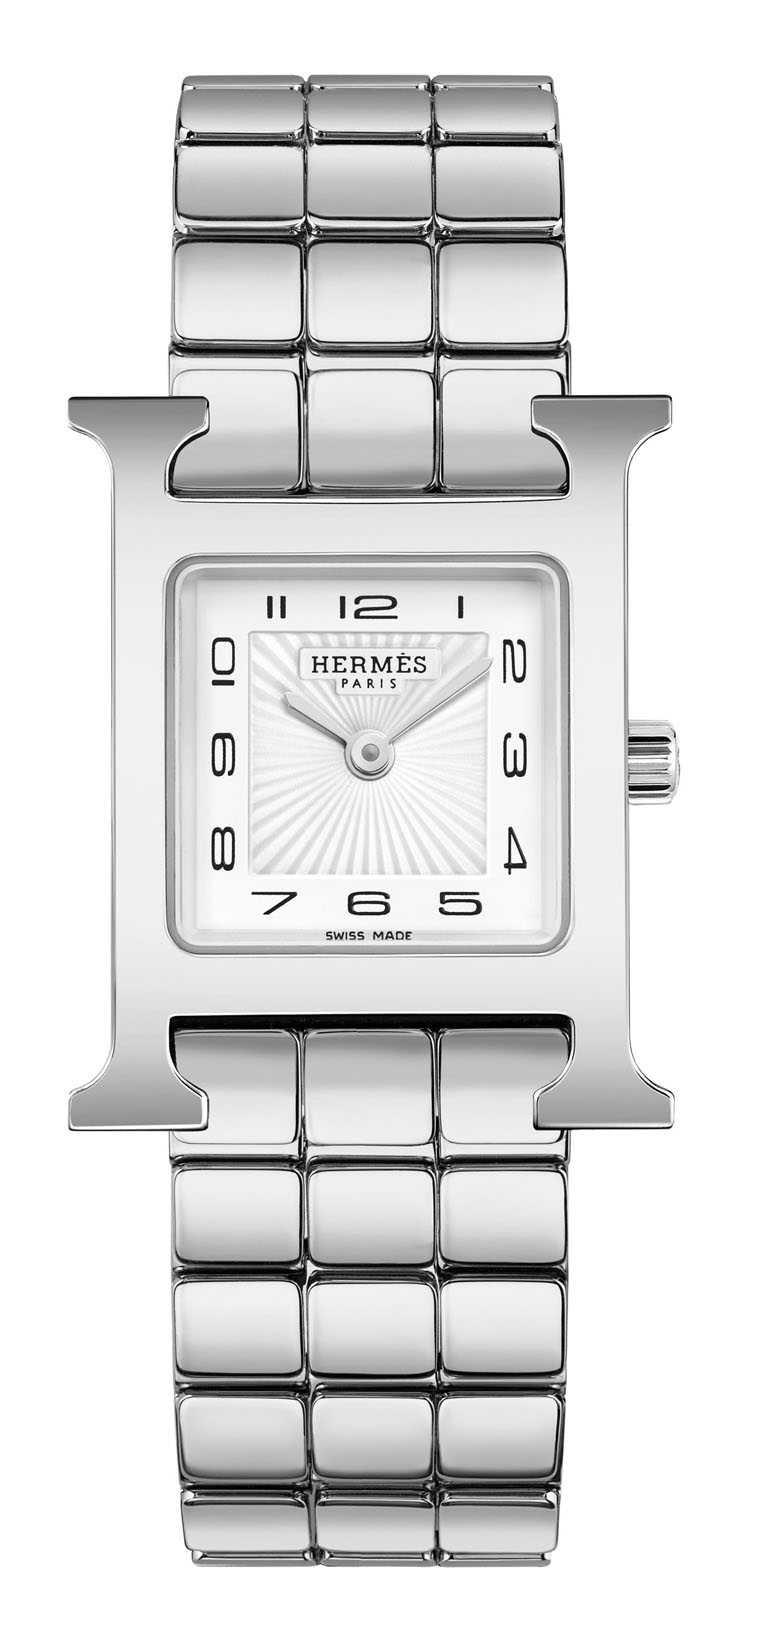 HERMÈS「HEURE H」精鋼鍊帶腕錶,316L精鋼錶殼,21mm,石英機芯╱103,700元。(圖╱HERMÈS提供)